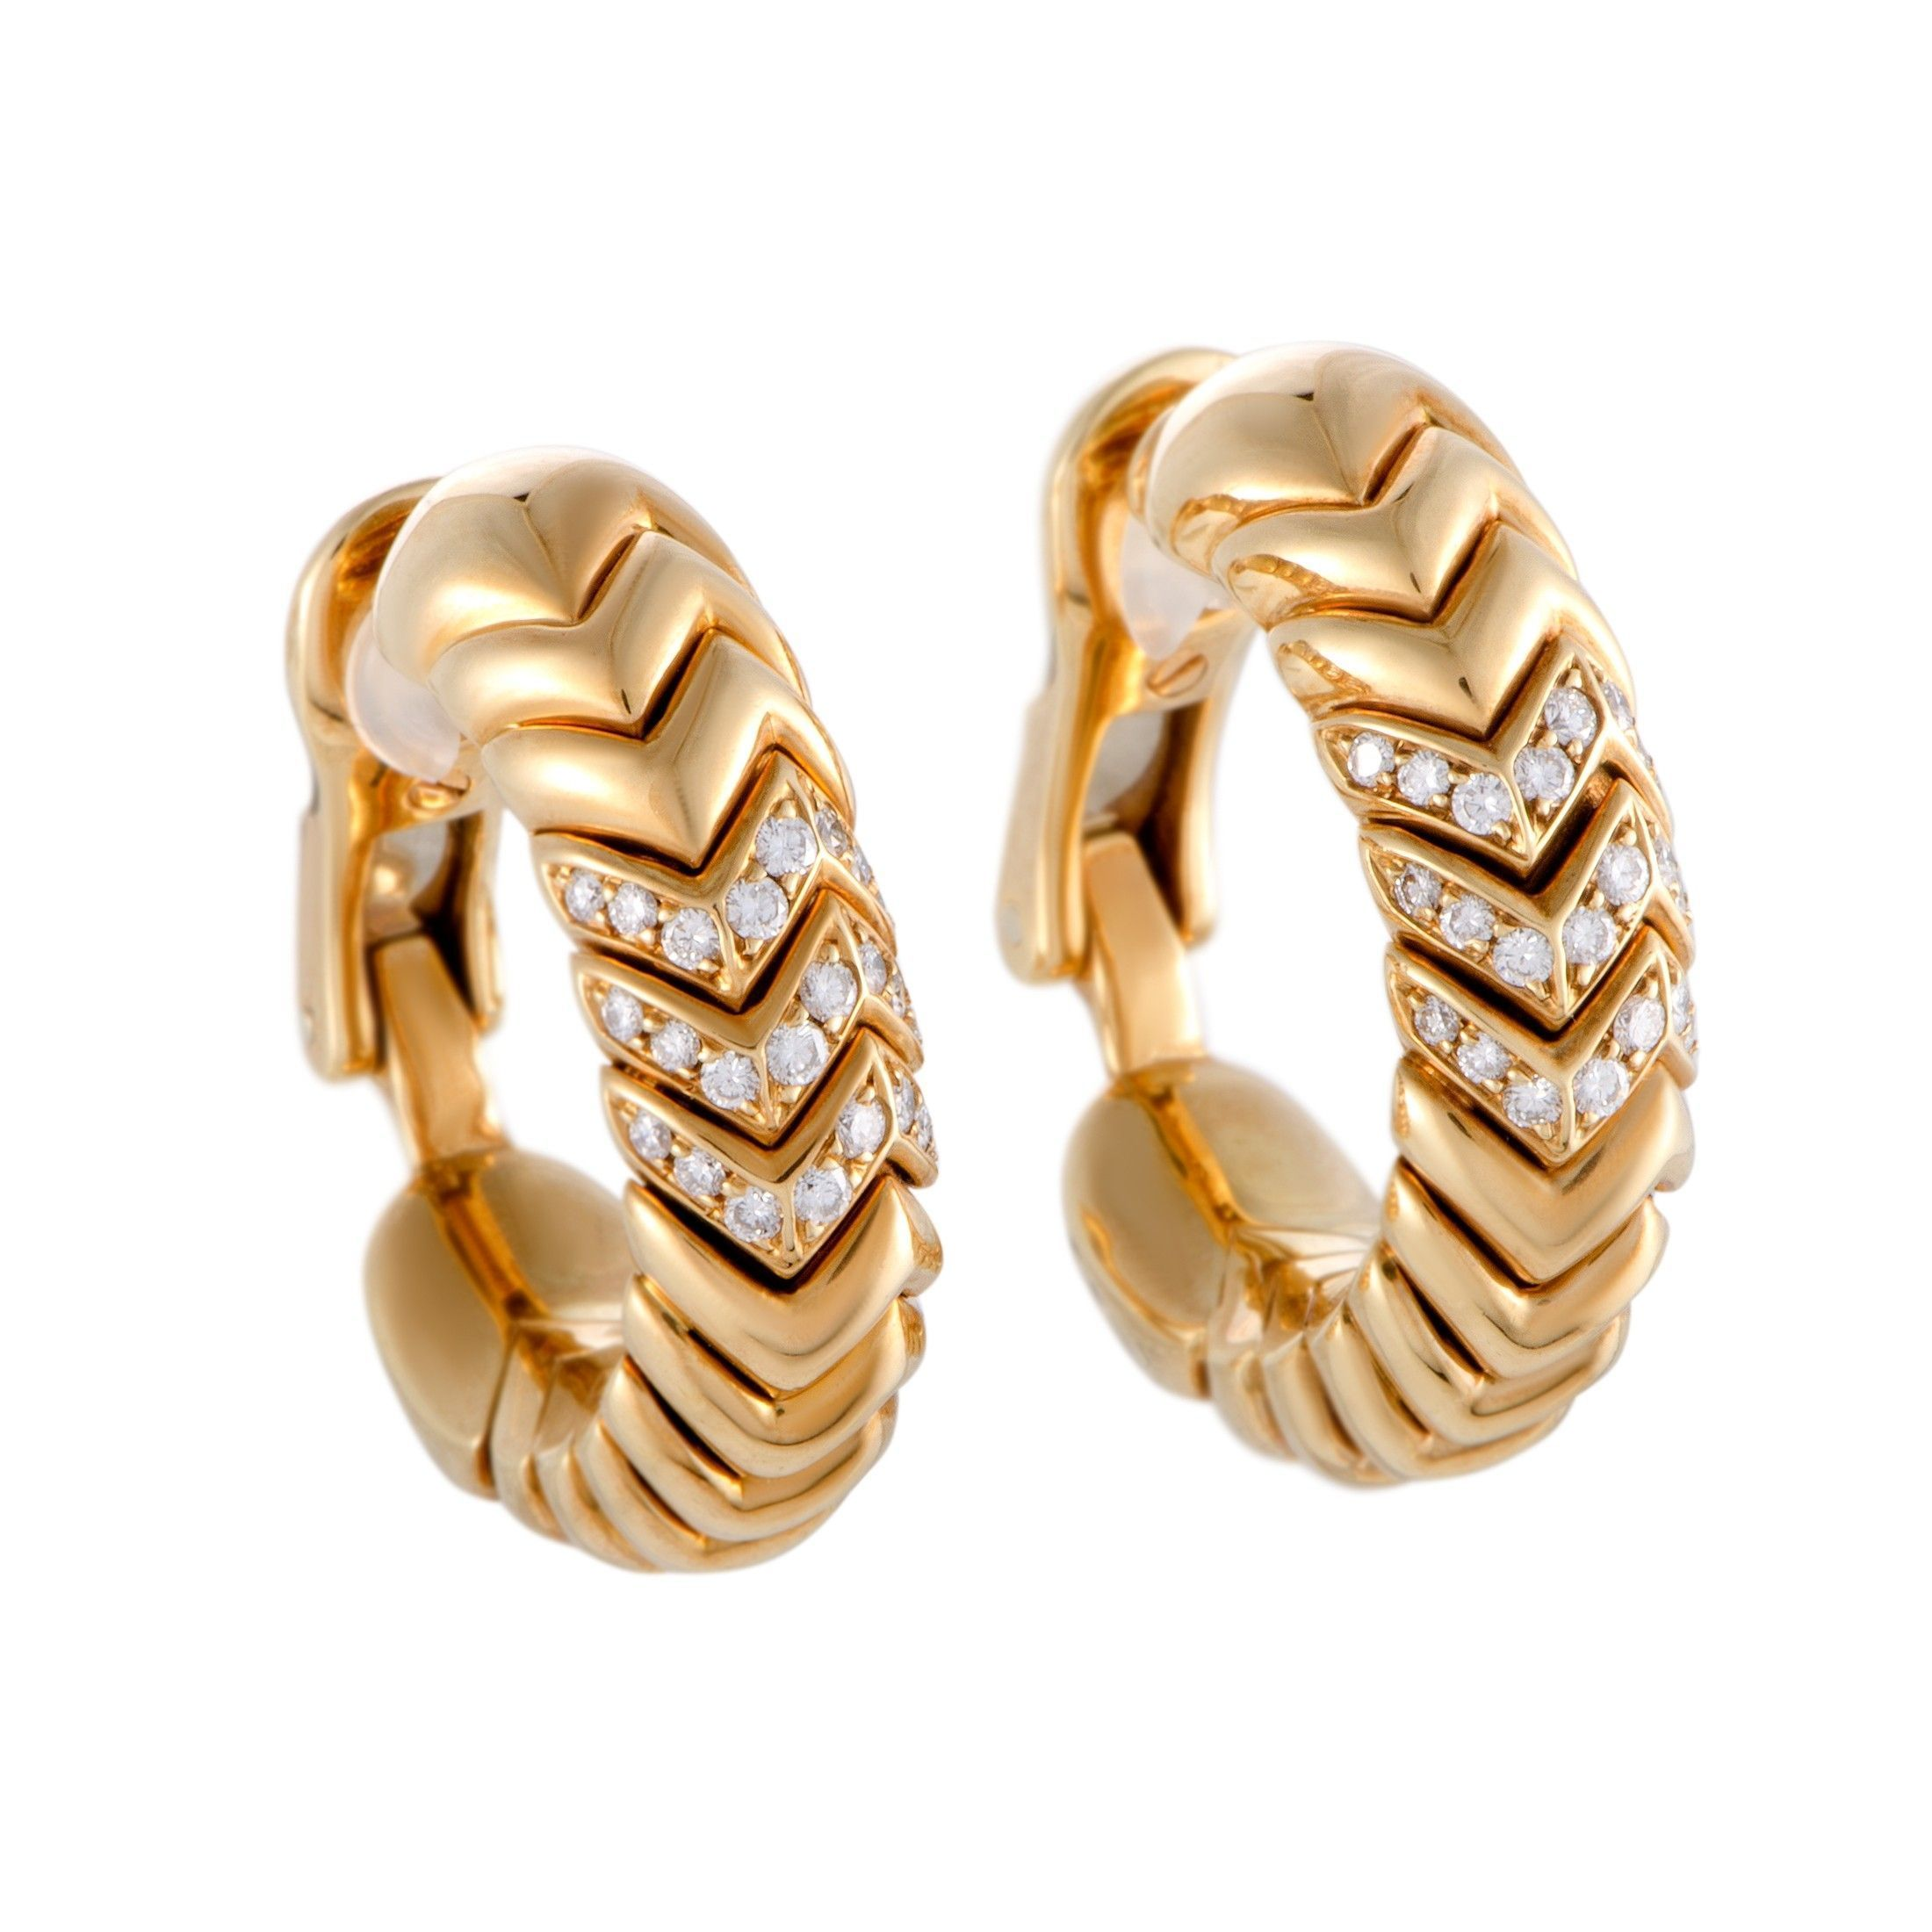 764ac8937 Bvlgari Spiga 18K Yellow Gold Diamond Pave Hoop Clip-on Earrings | Luxury  Bazaar | www.luxurybazaar.com